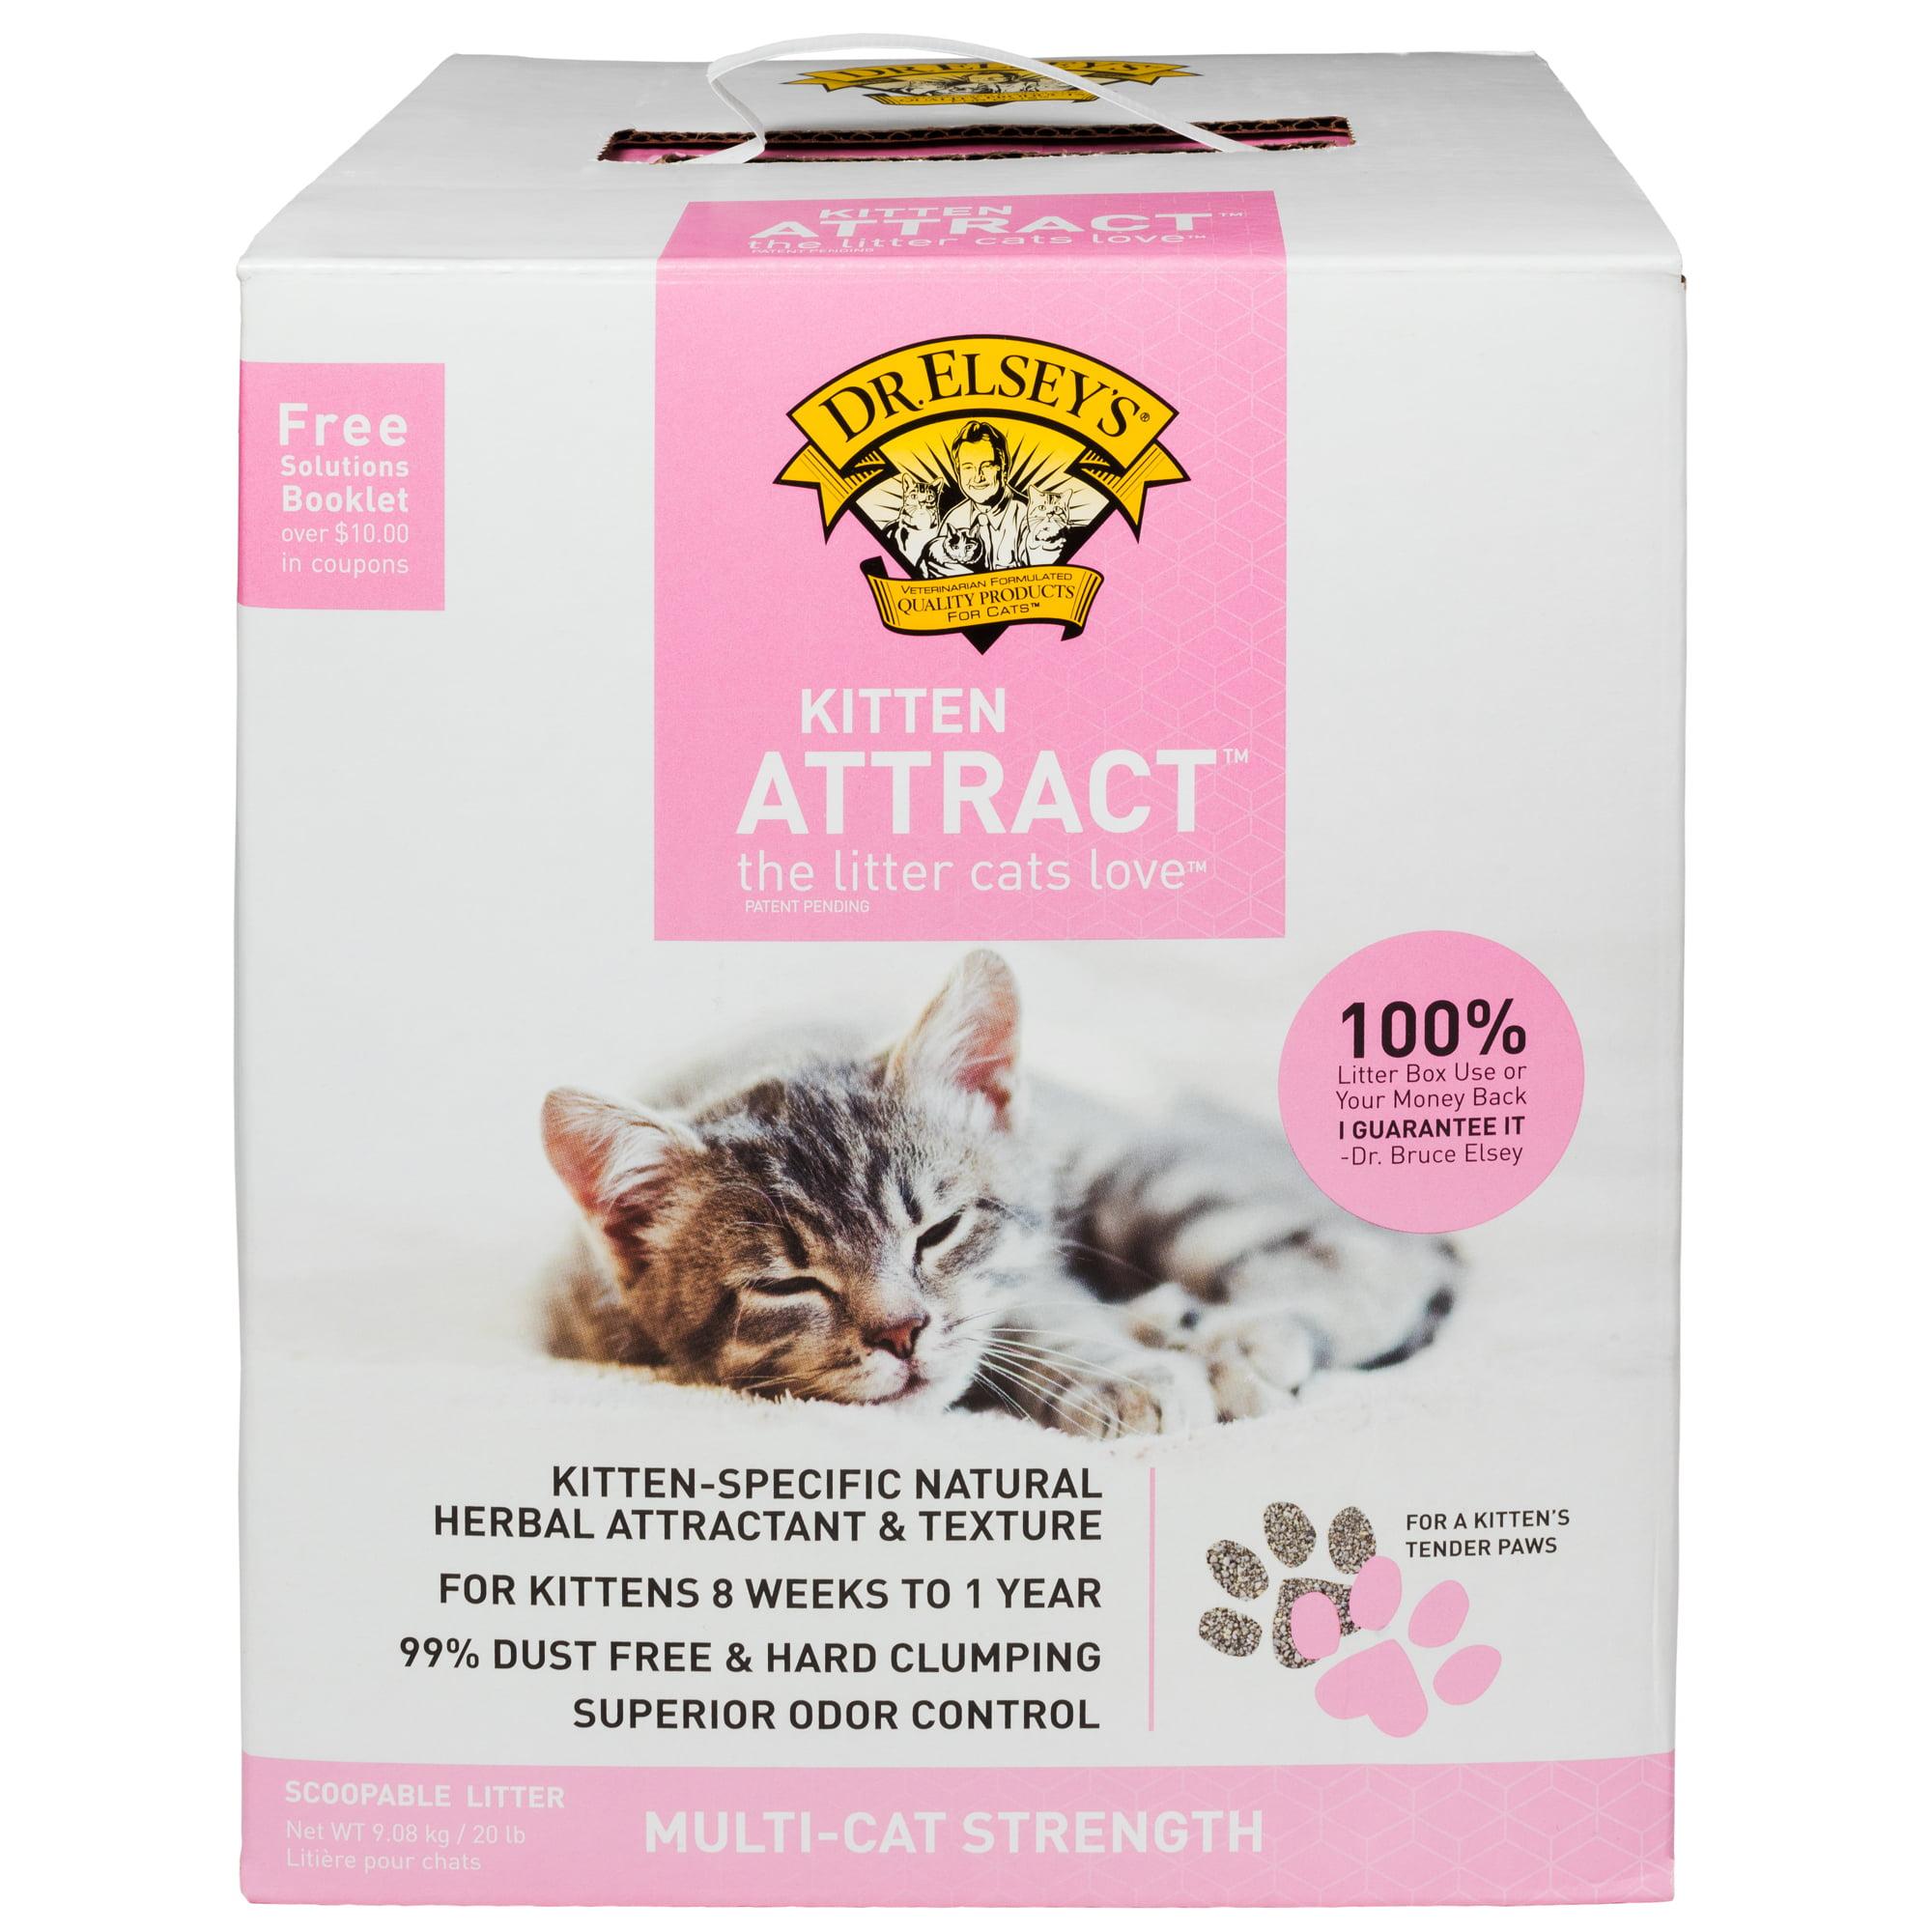 Dr. Elsey's Kitten Attract Training Cat Litter, 20-lb